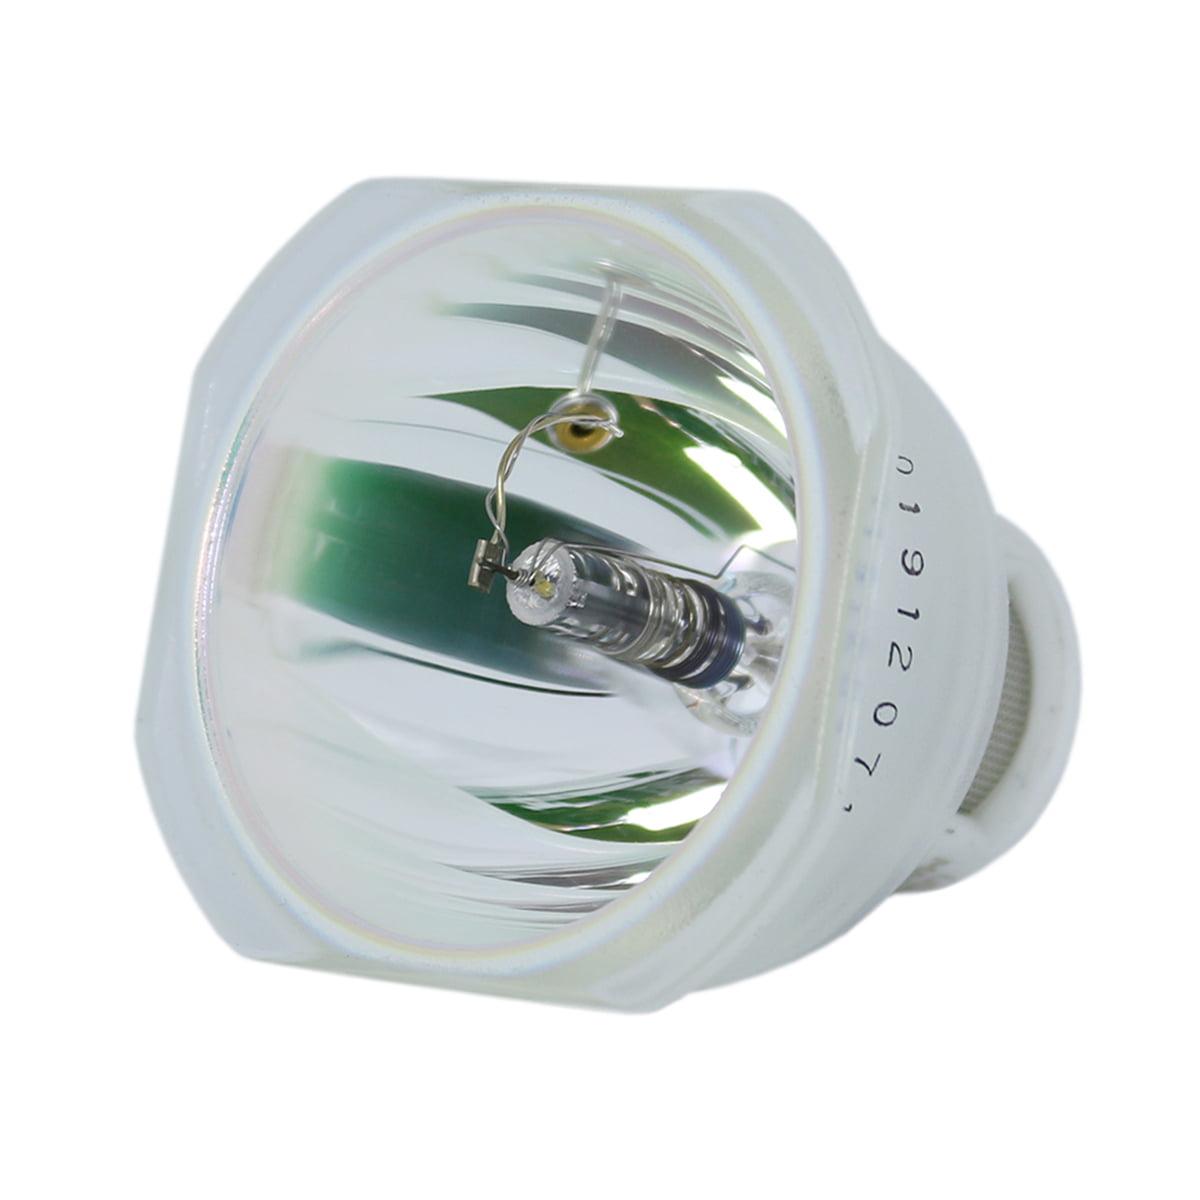 Boxlight CD725C-930 / CD725C930 Ushio Original Bare Projector Lamp DLP LCD